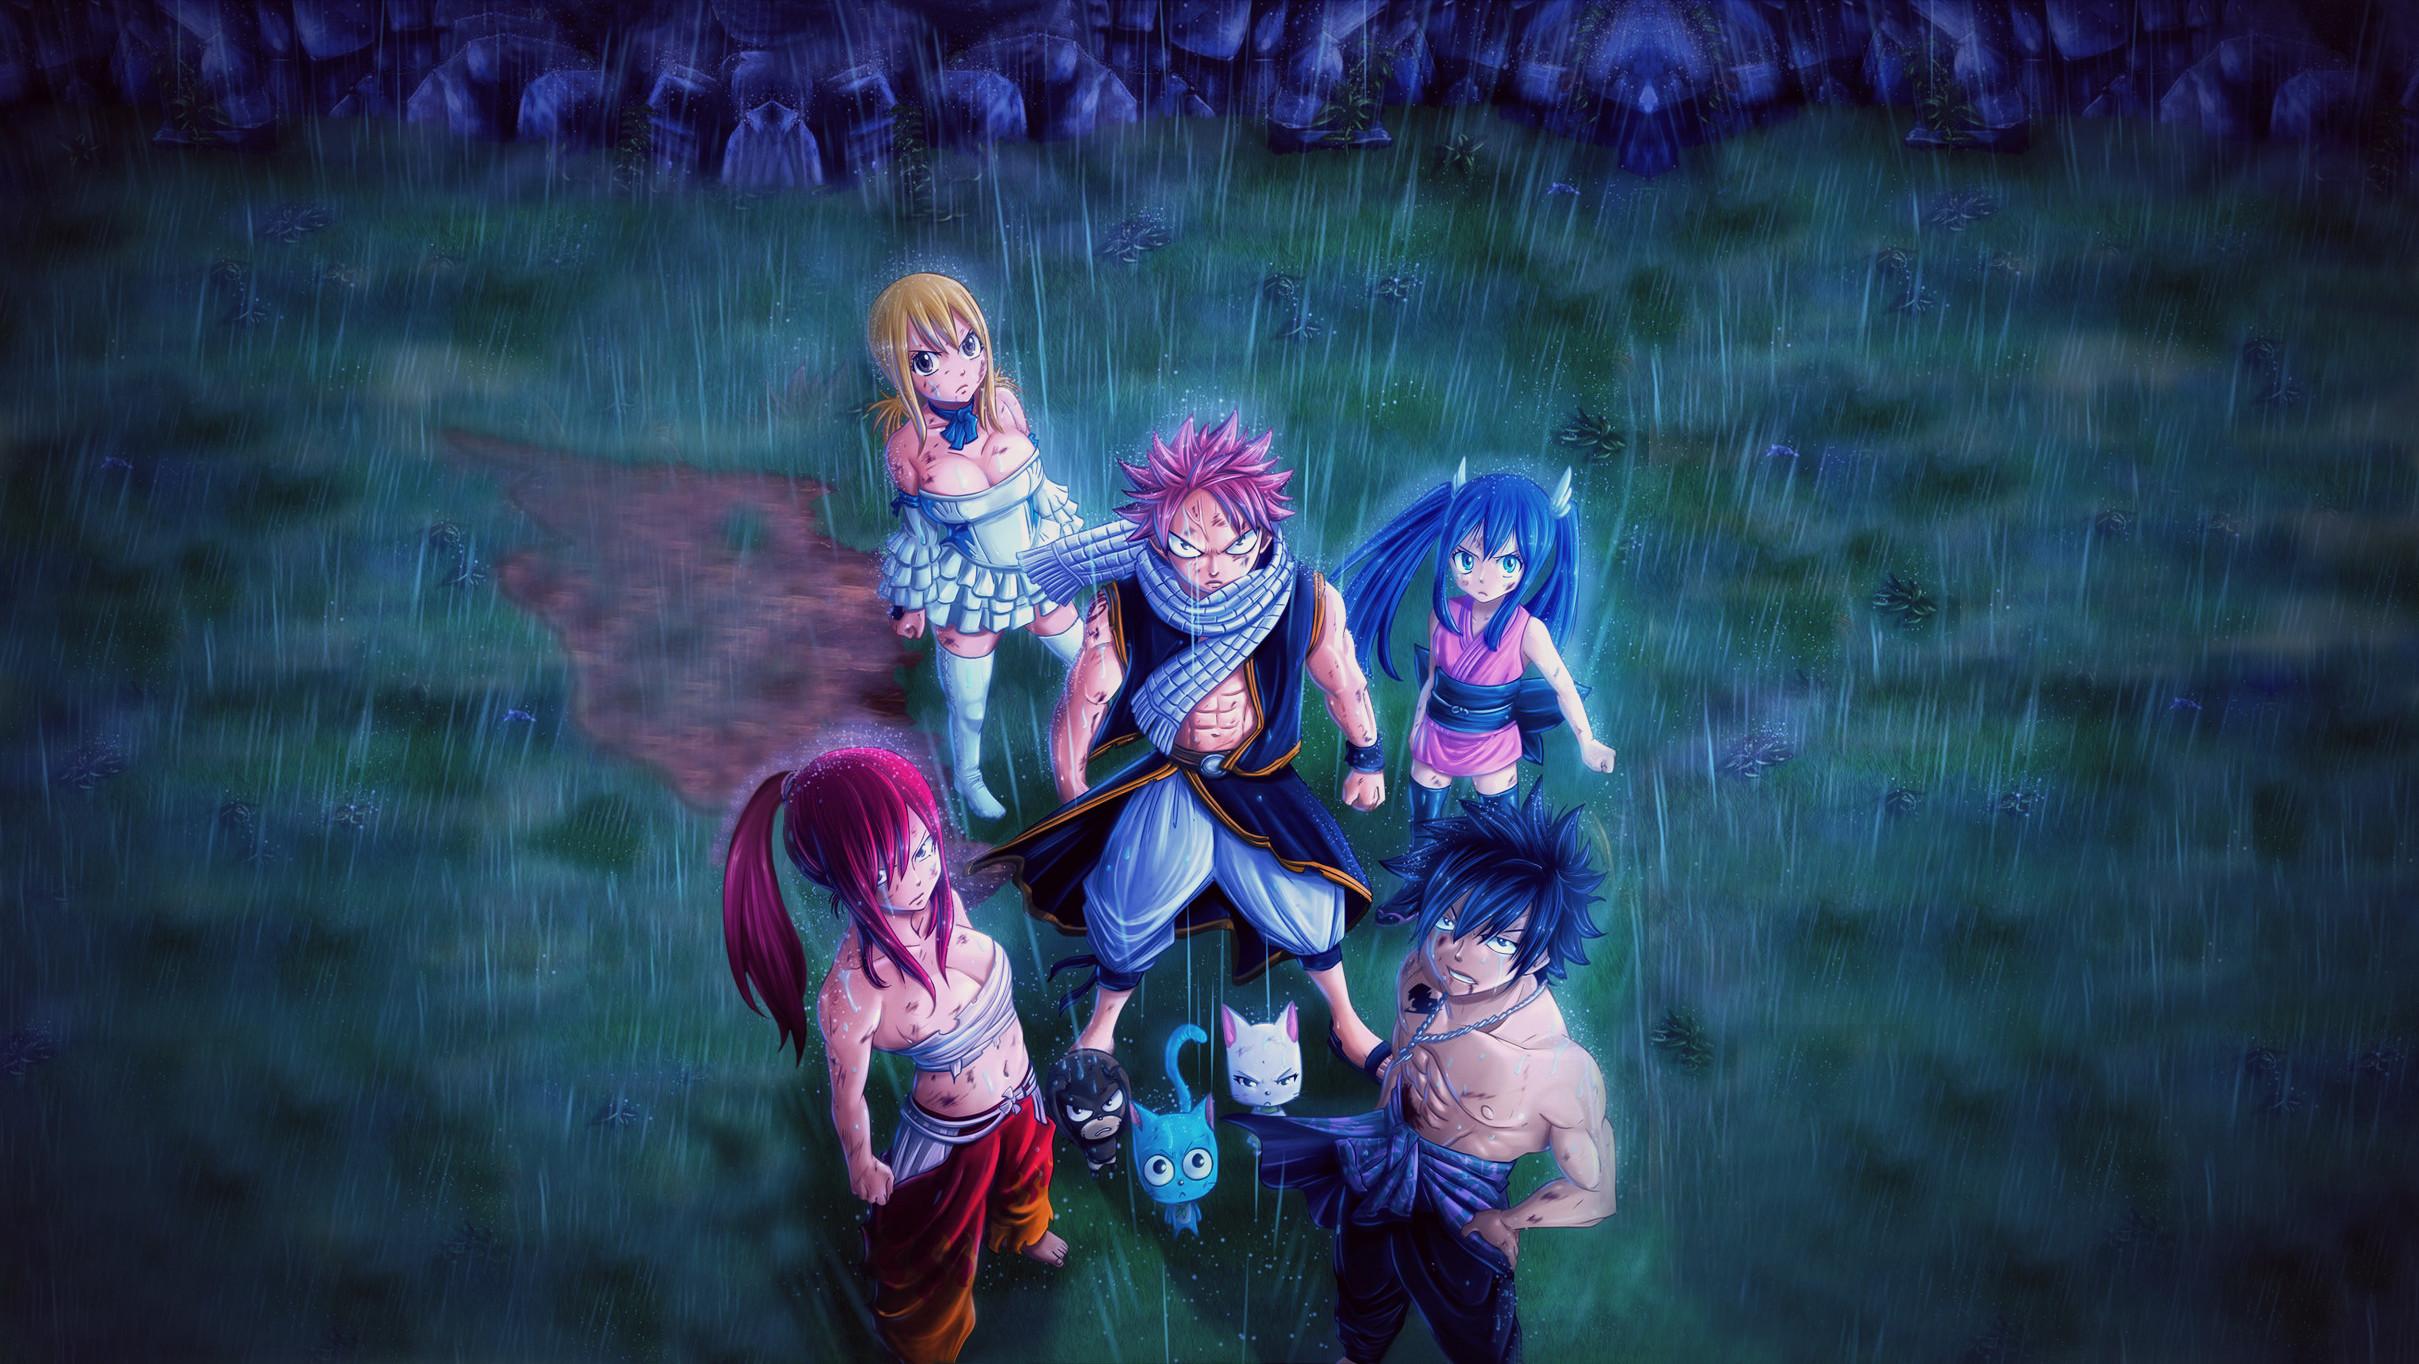 Anime – Fairy Tail Erza Scarlet Wendy Marvell Rain Manga Anime Lucy  Heartfilia Natsu Dragneel Gray